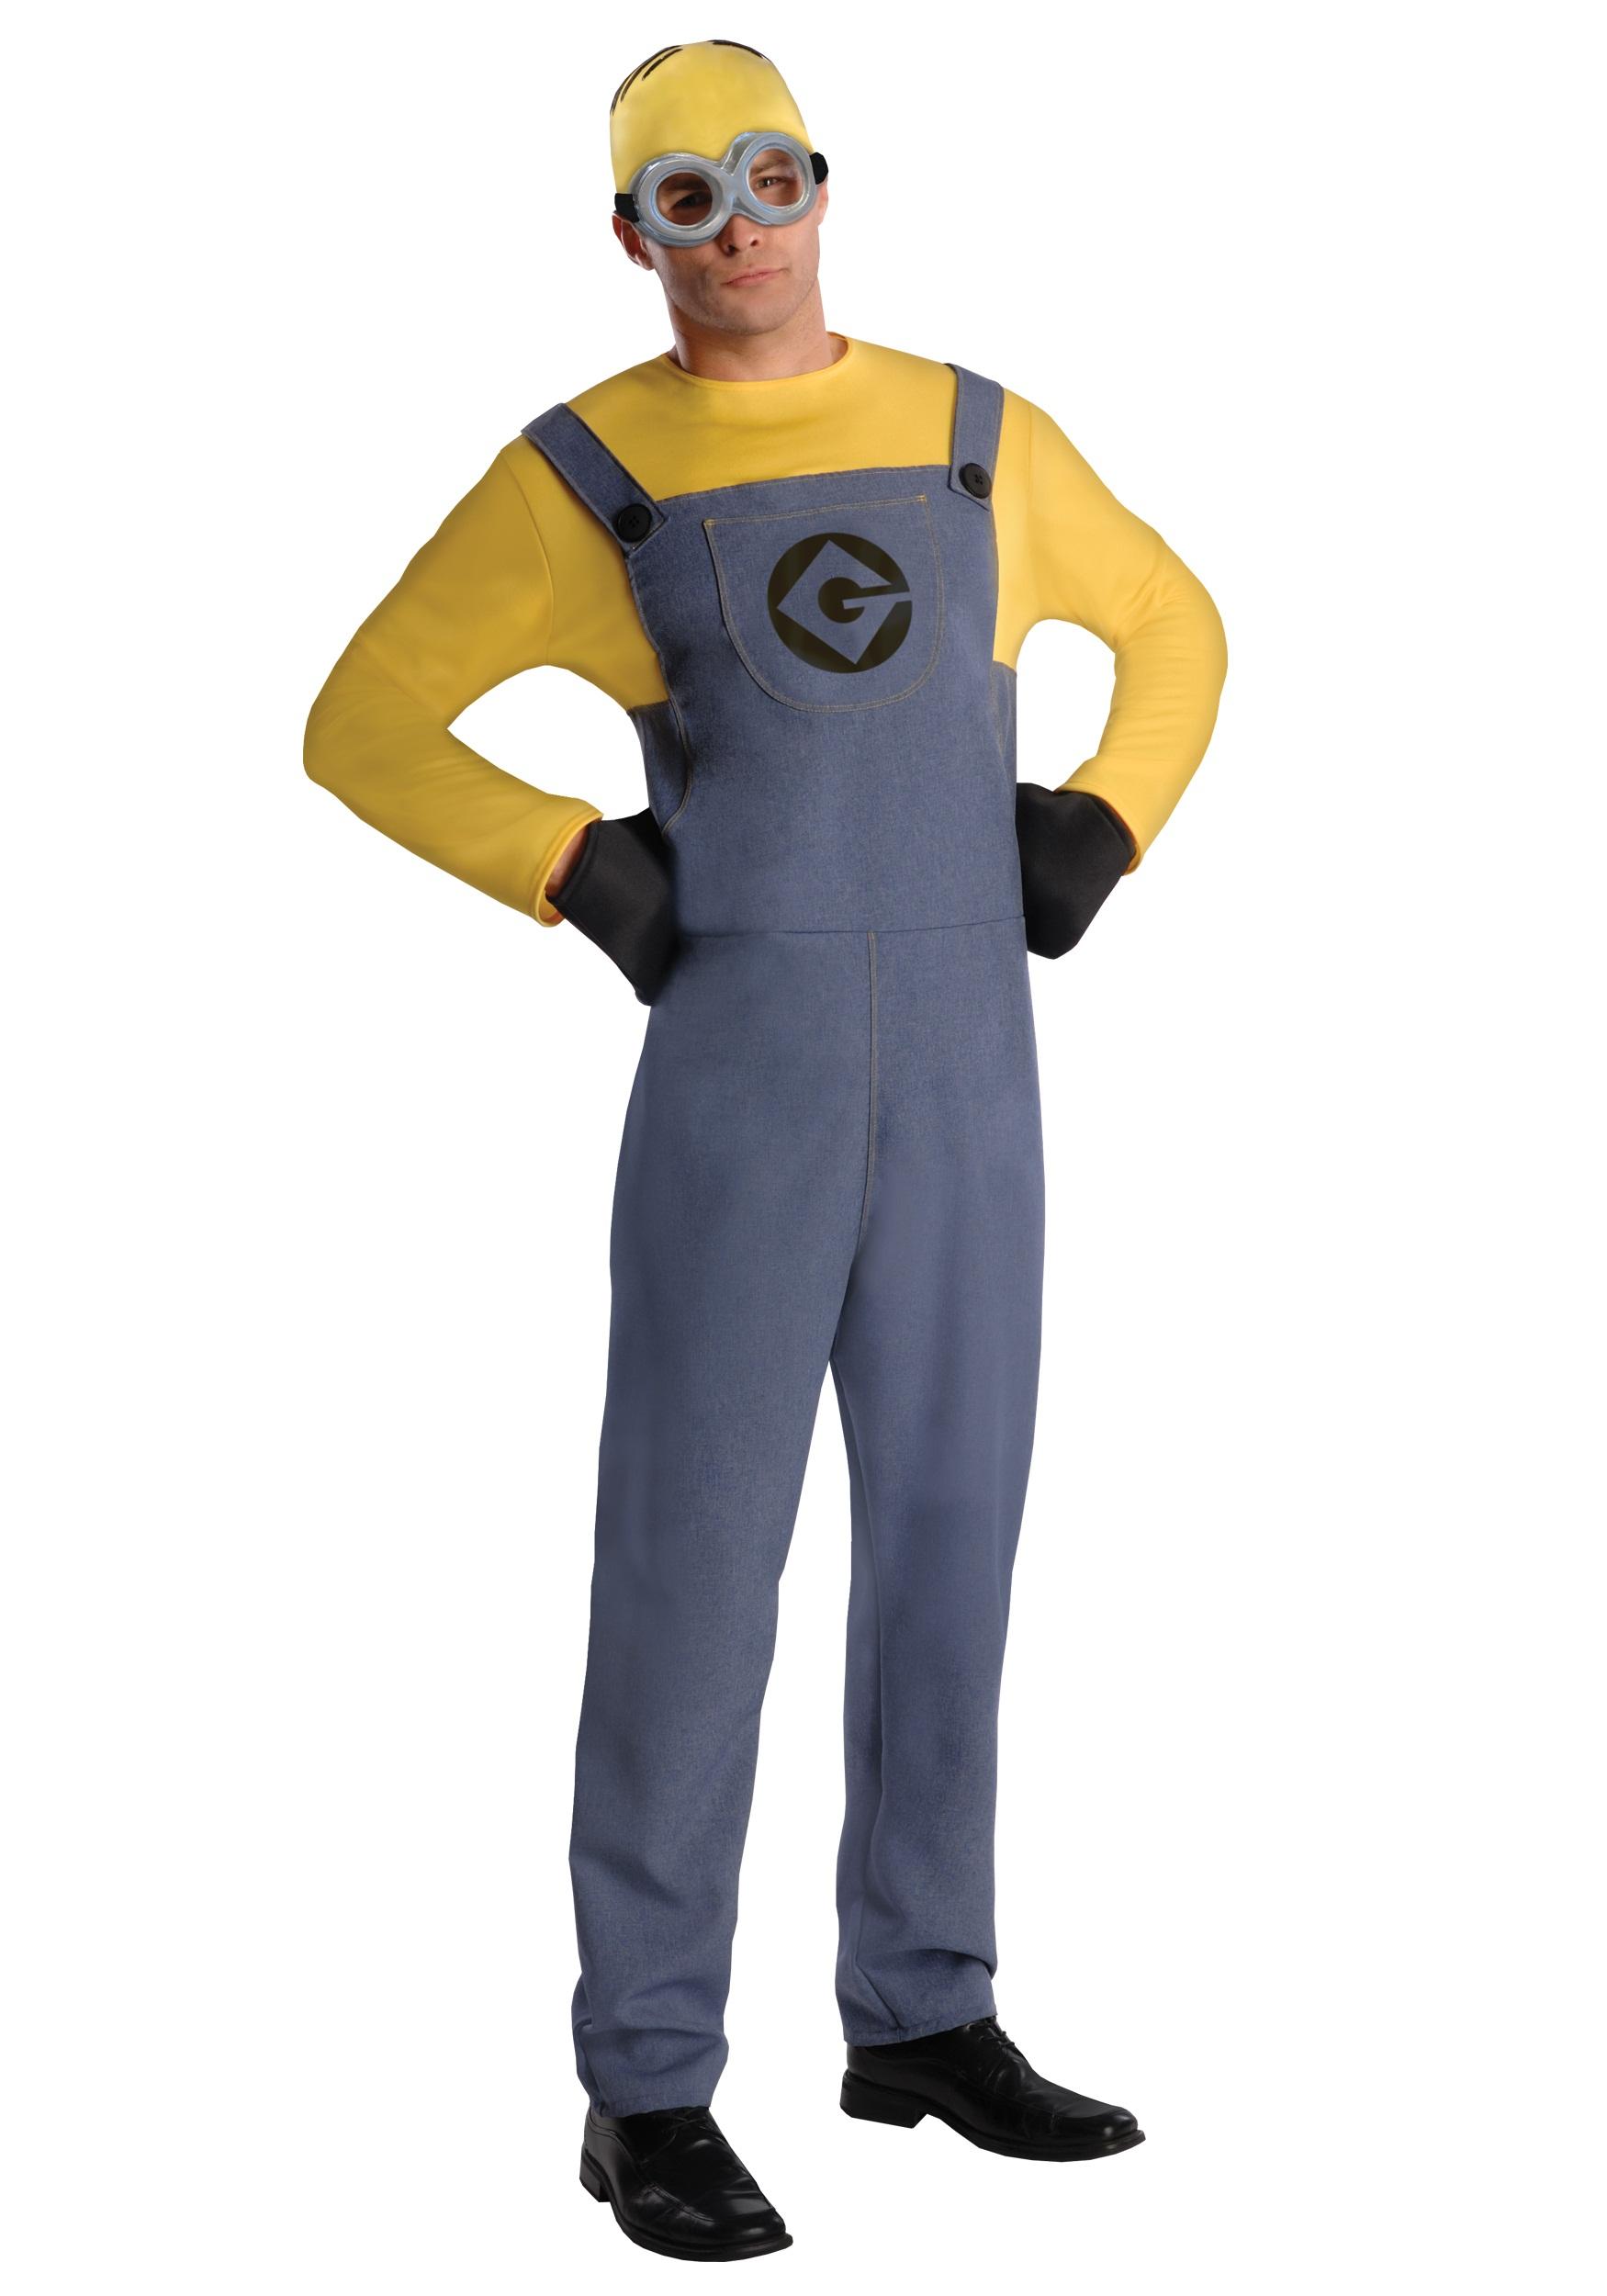 Adult Dave Minion CostumeMinions Adult Costume